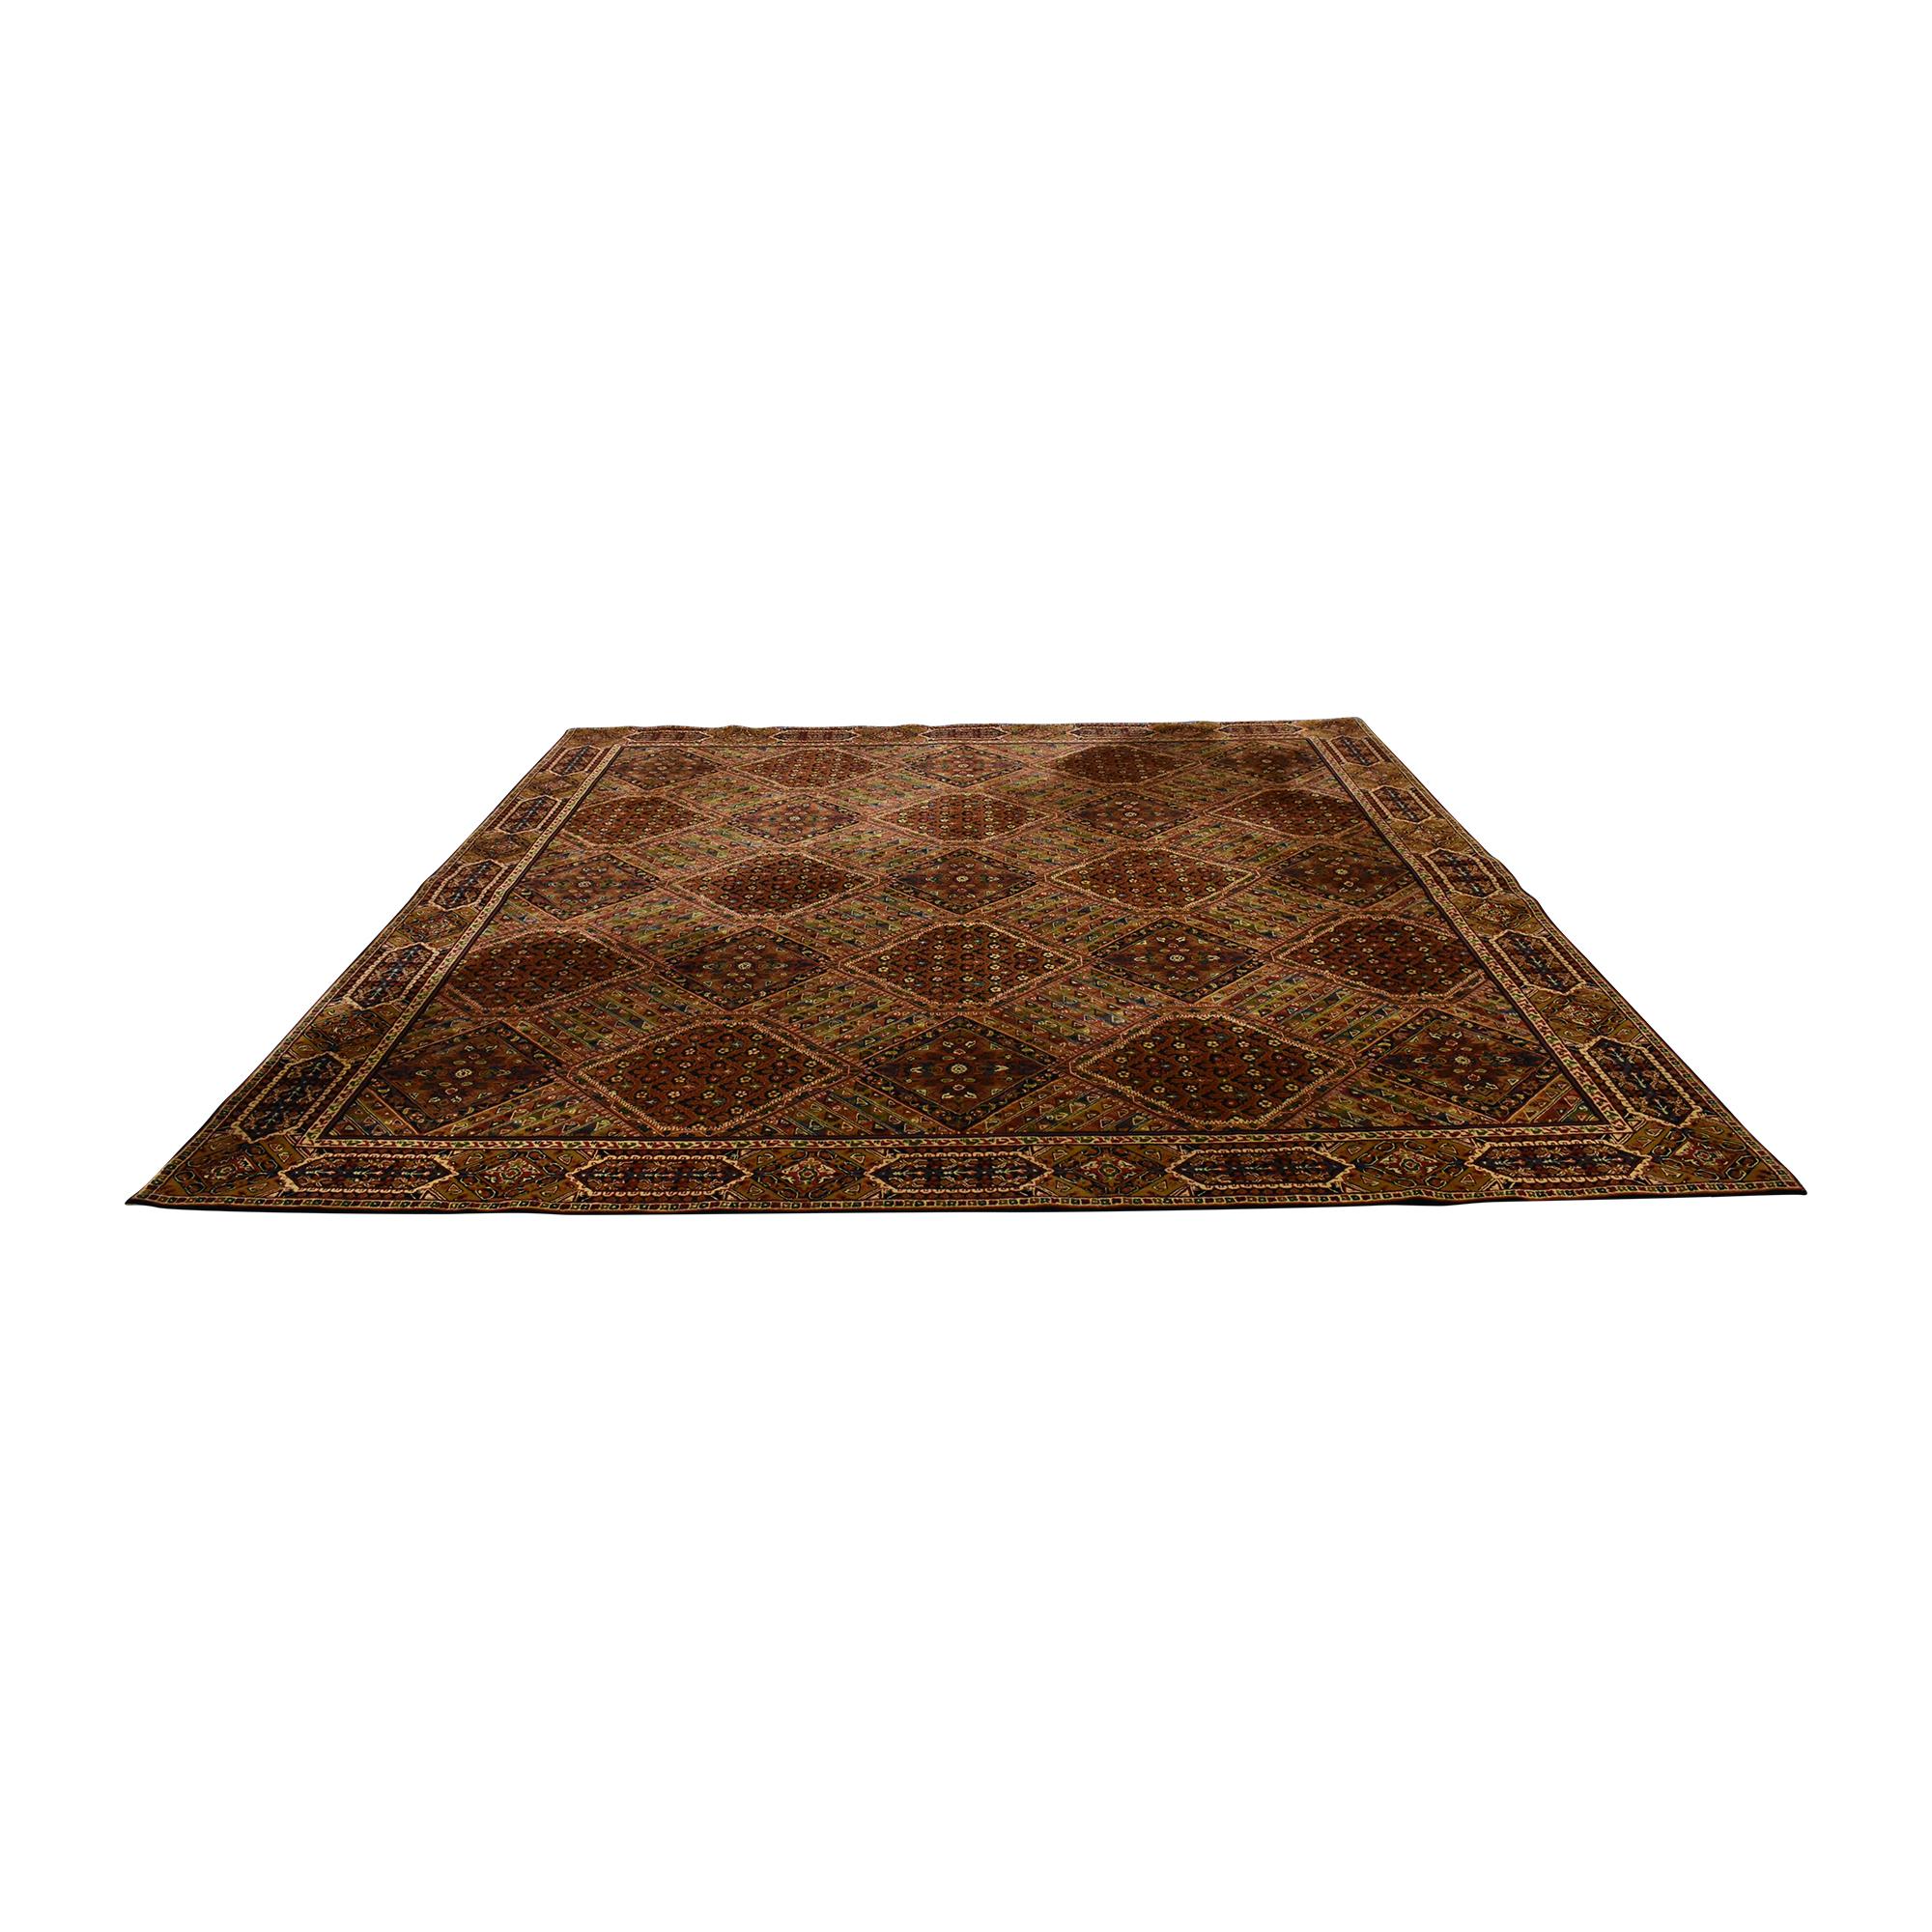 Stark Carpet Stark Carpet Patterned Area Rug multi colored